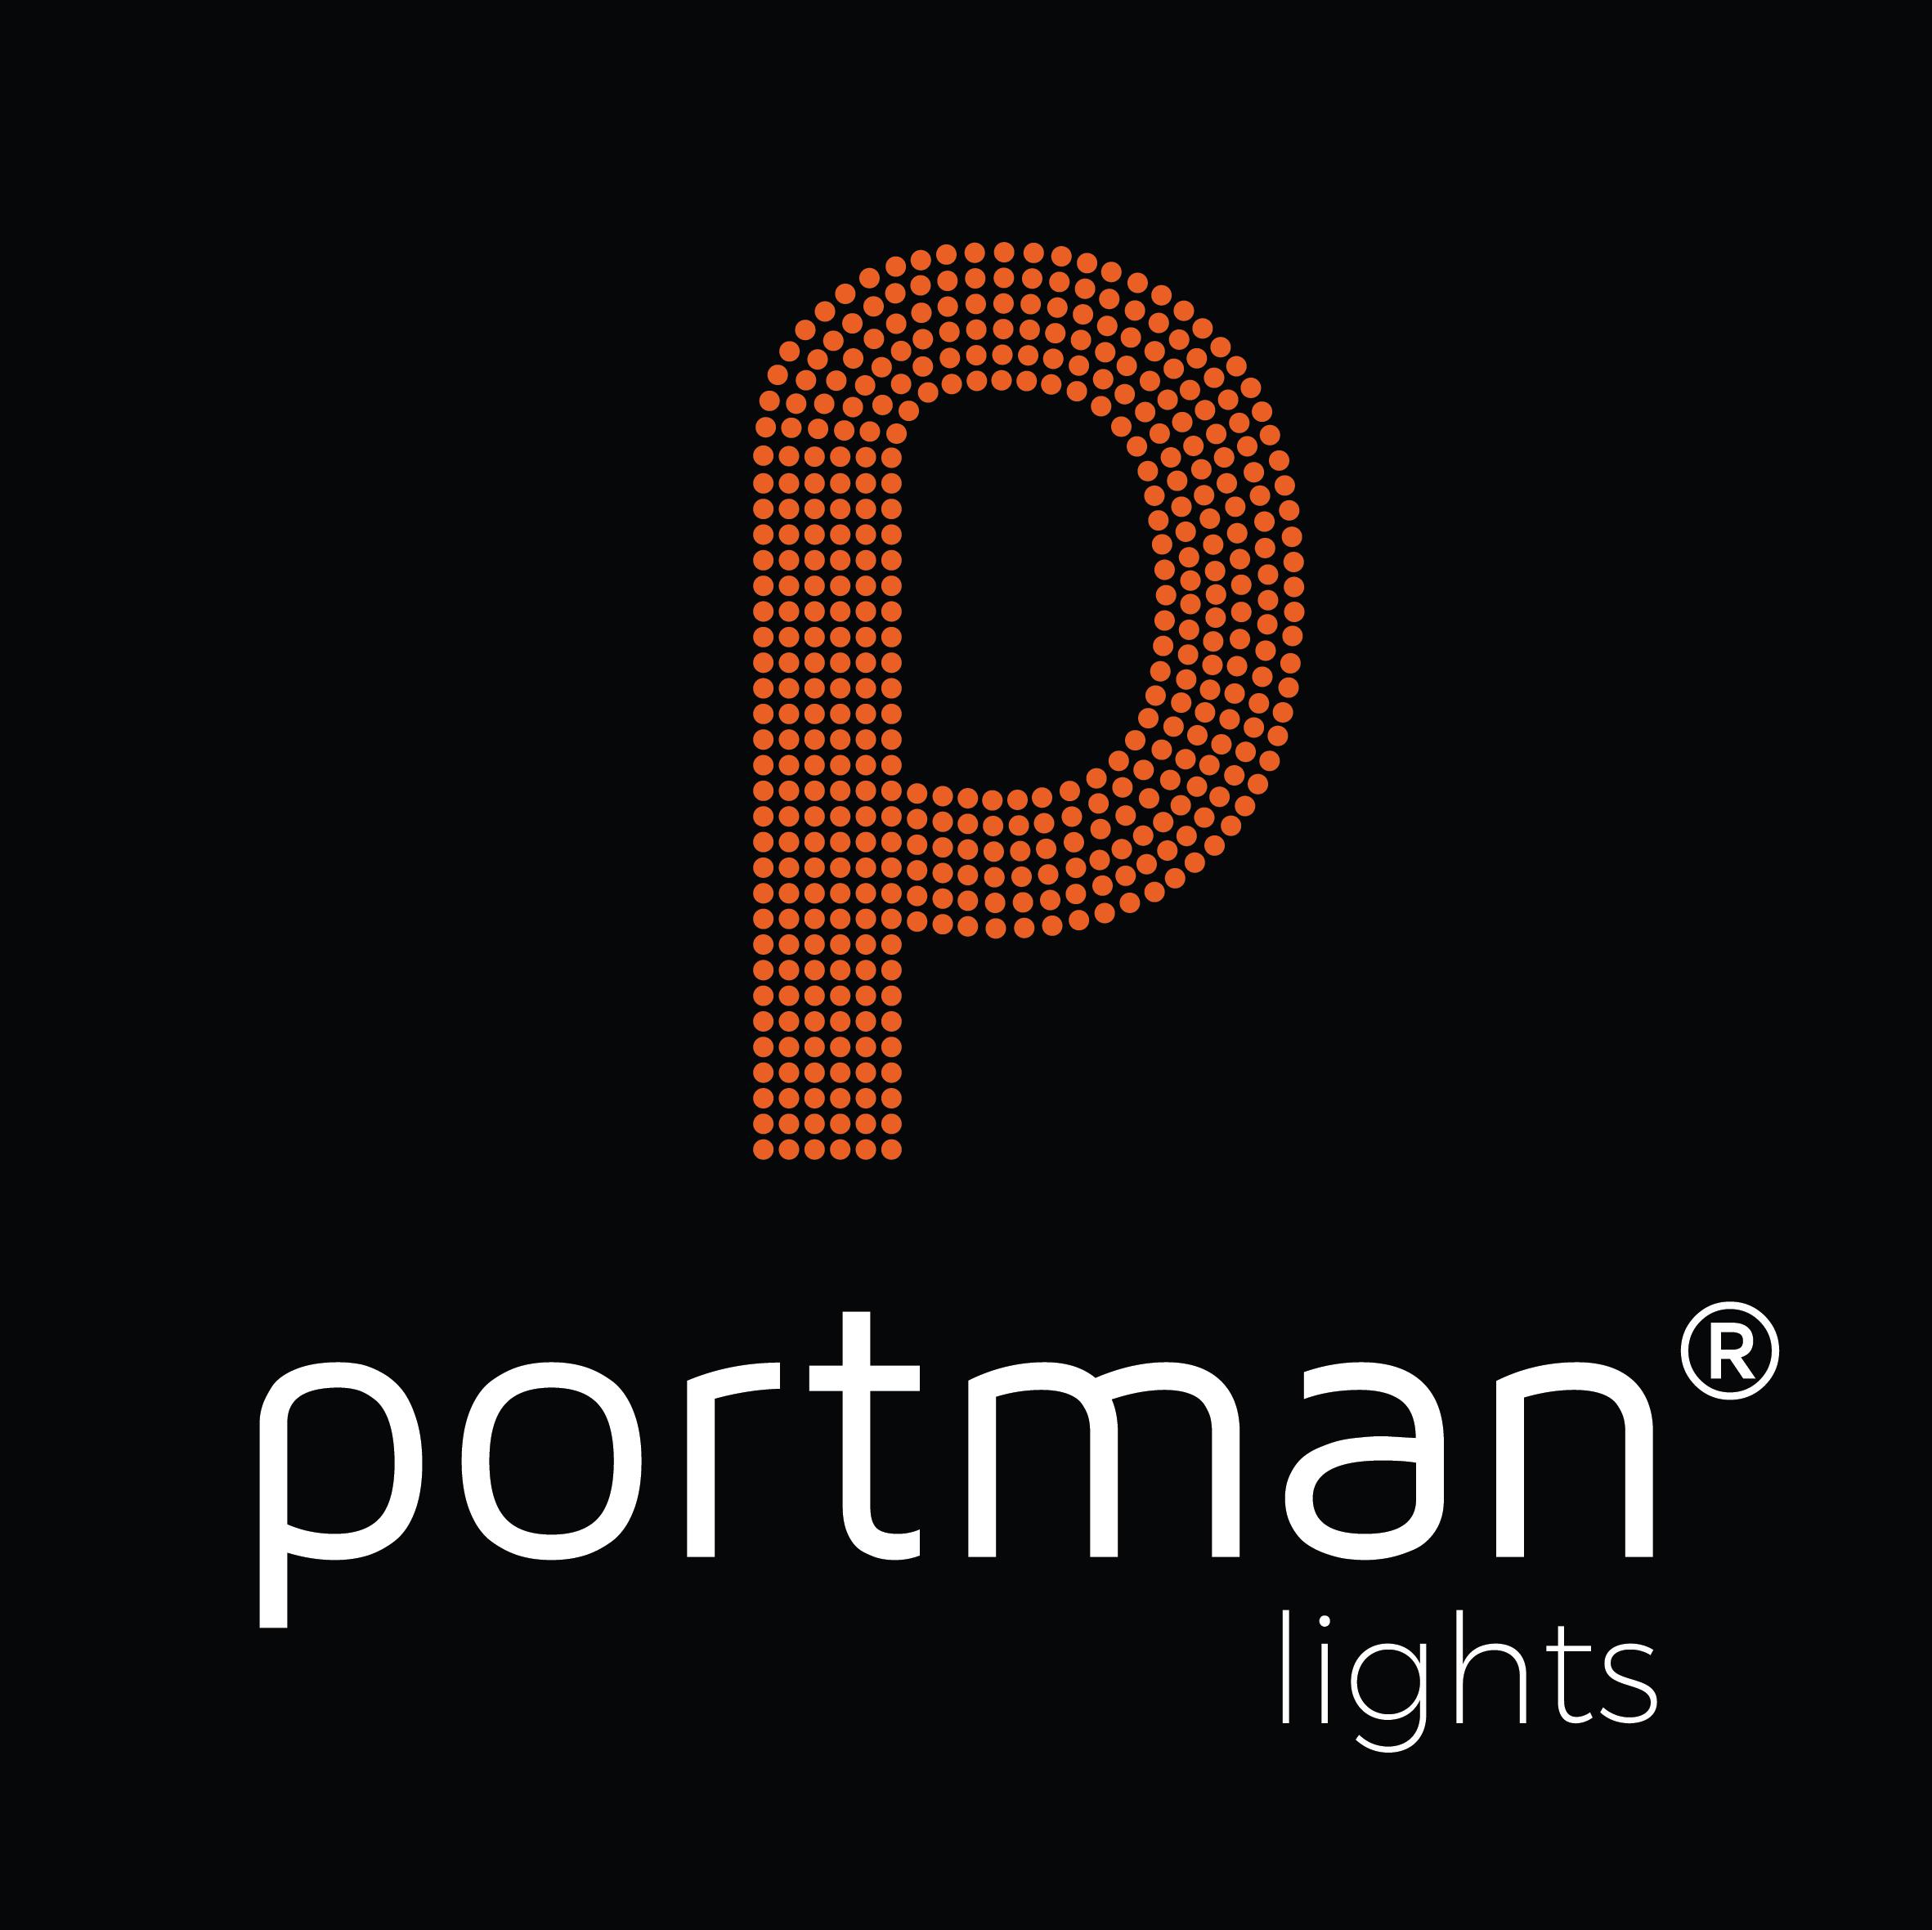 Rock Distribution - official distributor of Portman Lights